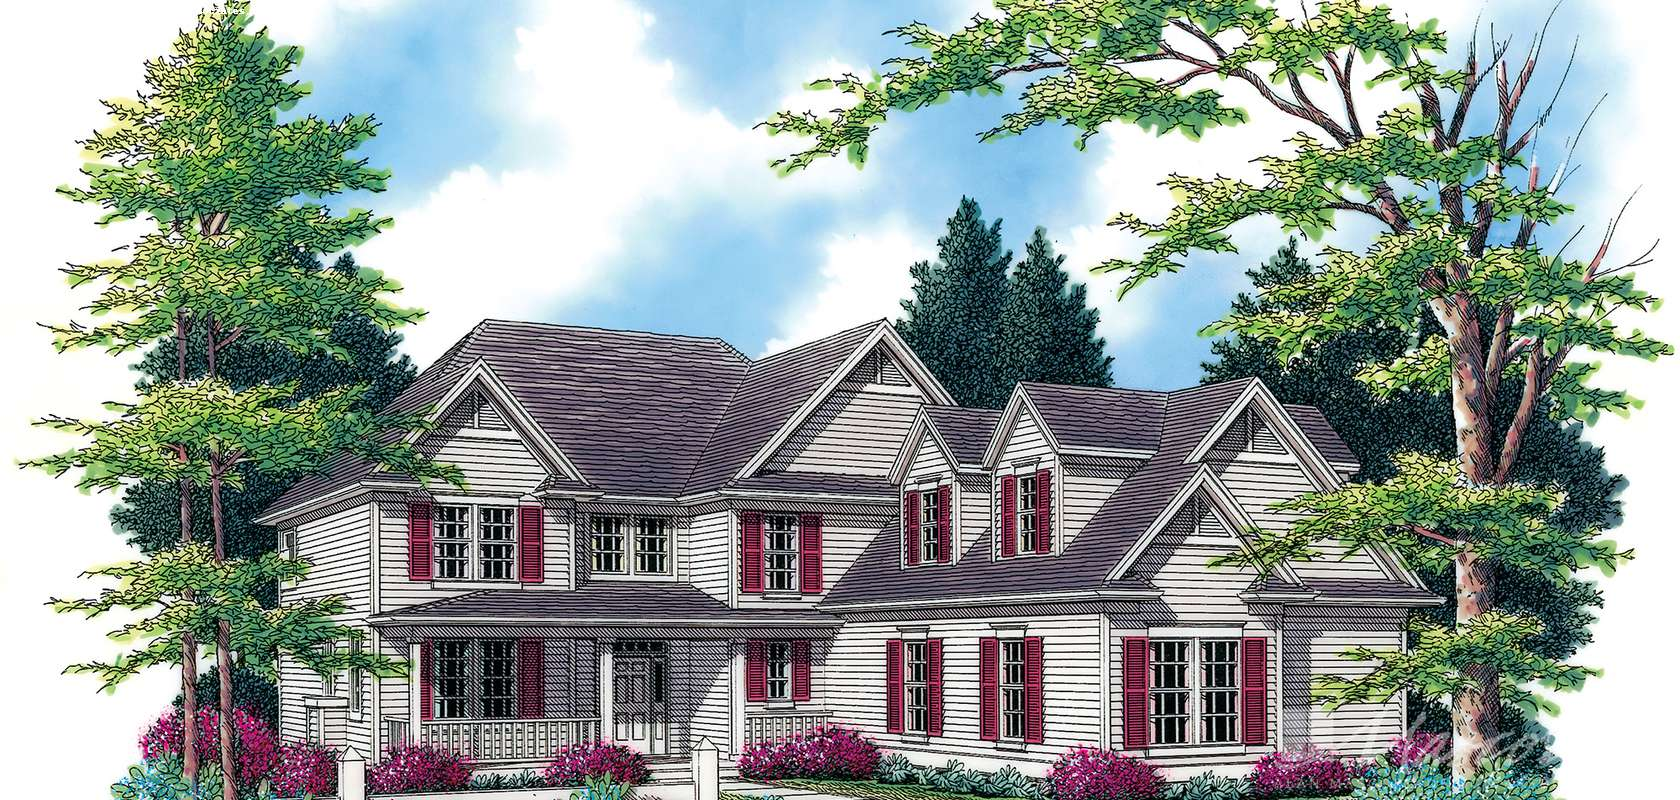 Mascord House Plan B2239PG: The Inwood